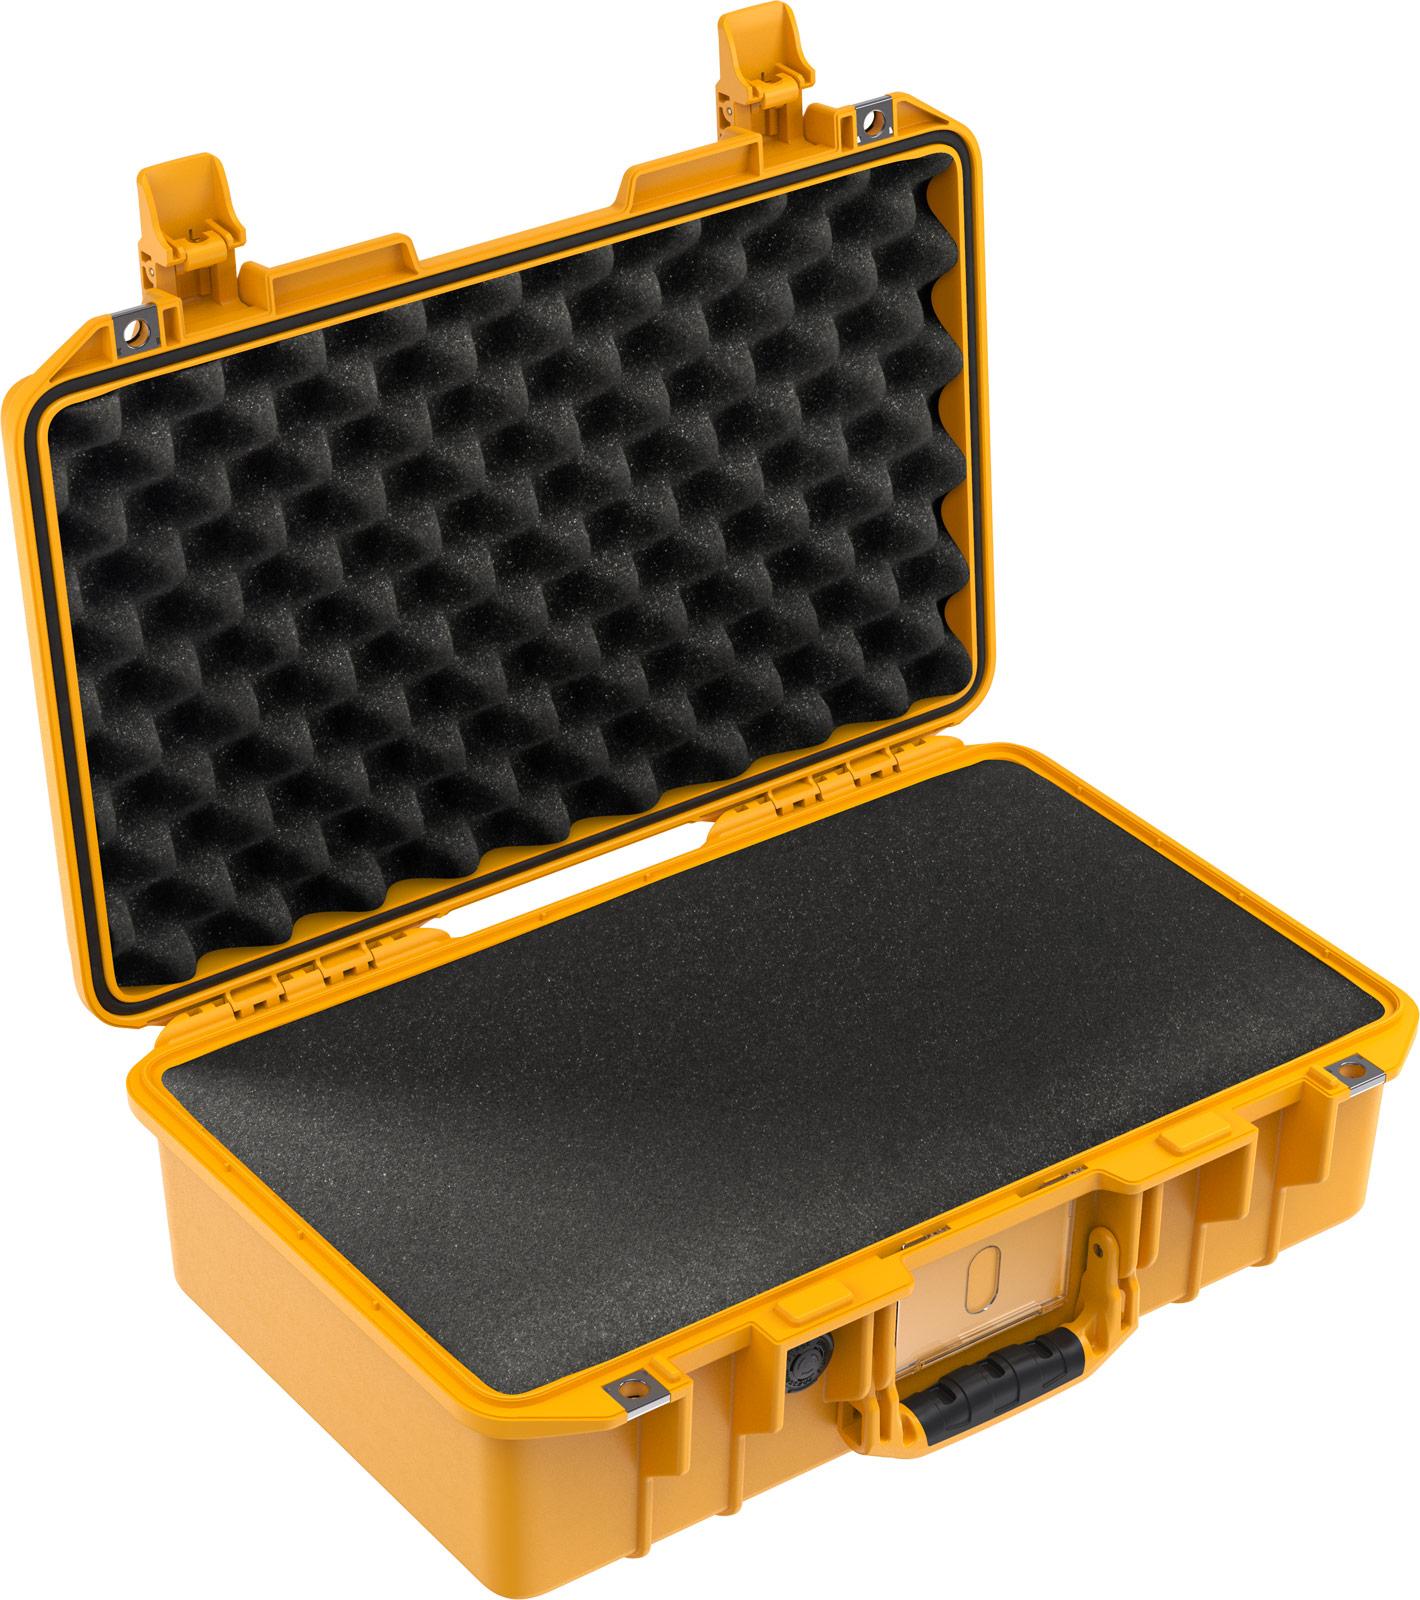 pelican air 1485 yellow camera foam case